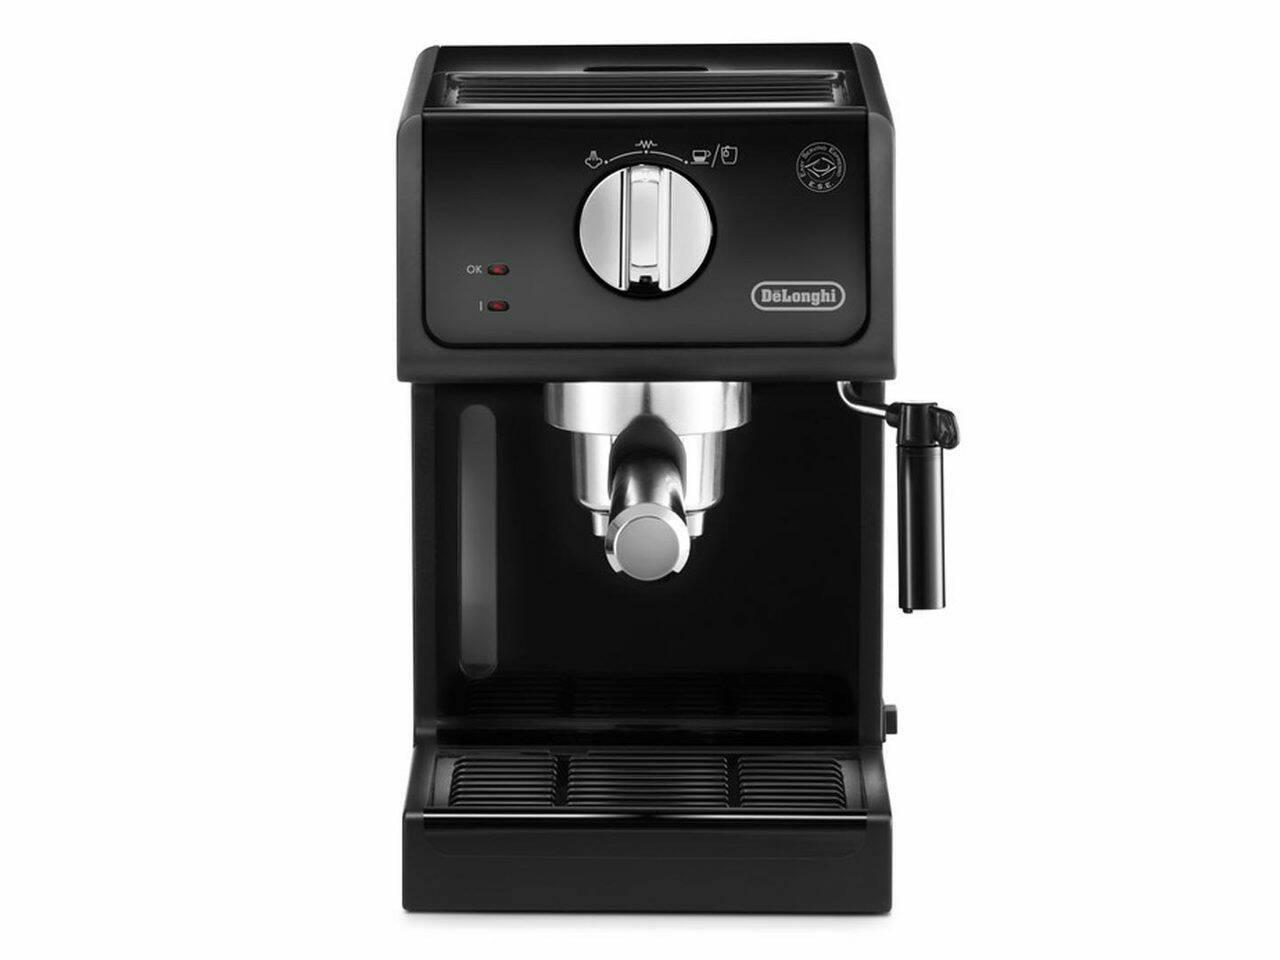 Jumlah Filter 3 Delonghi Coffe Maker ECP 31.21 - Hitam